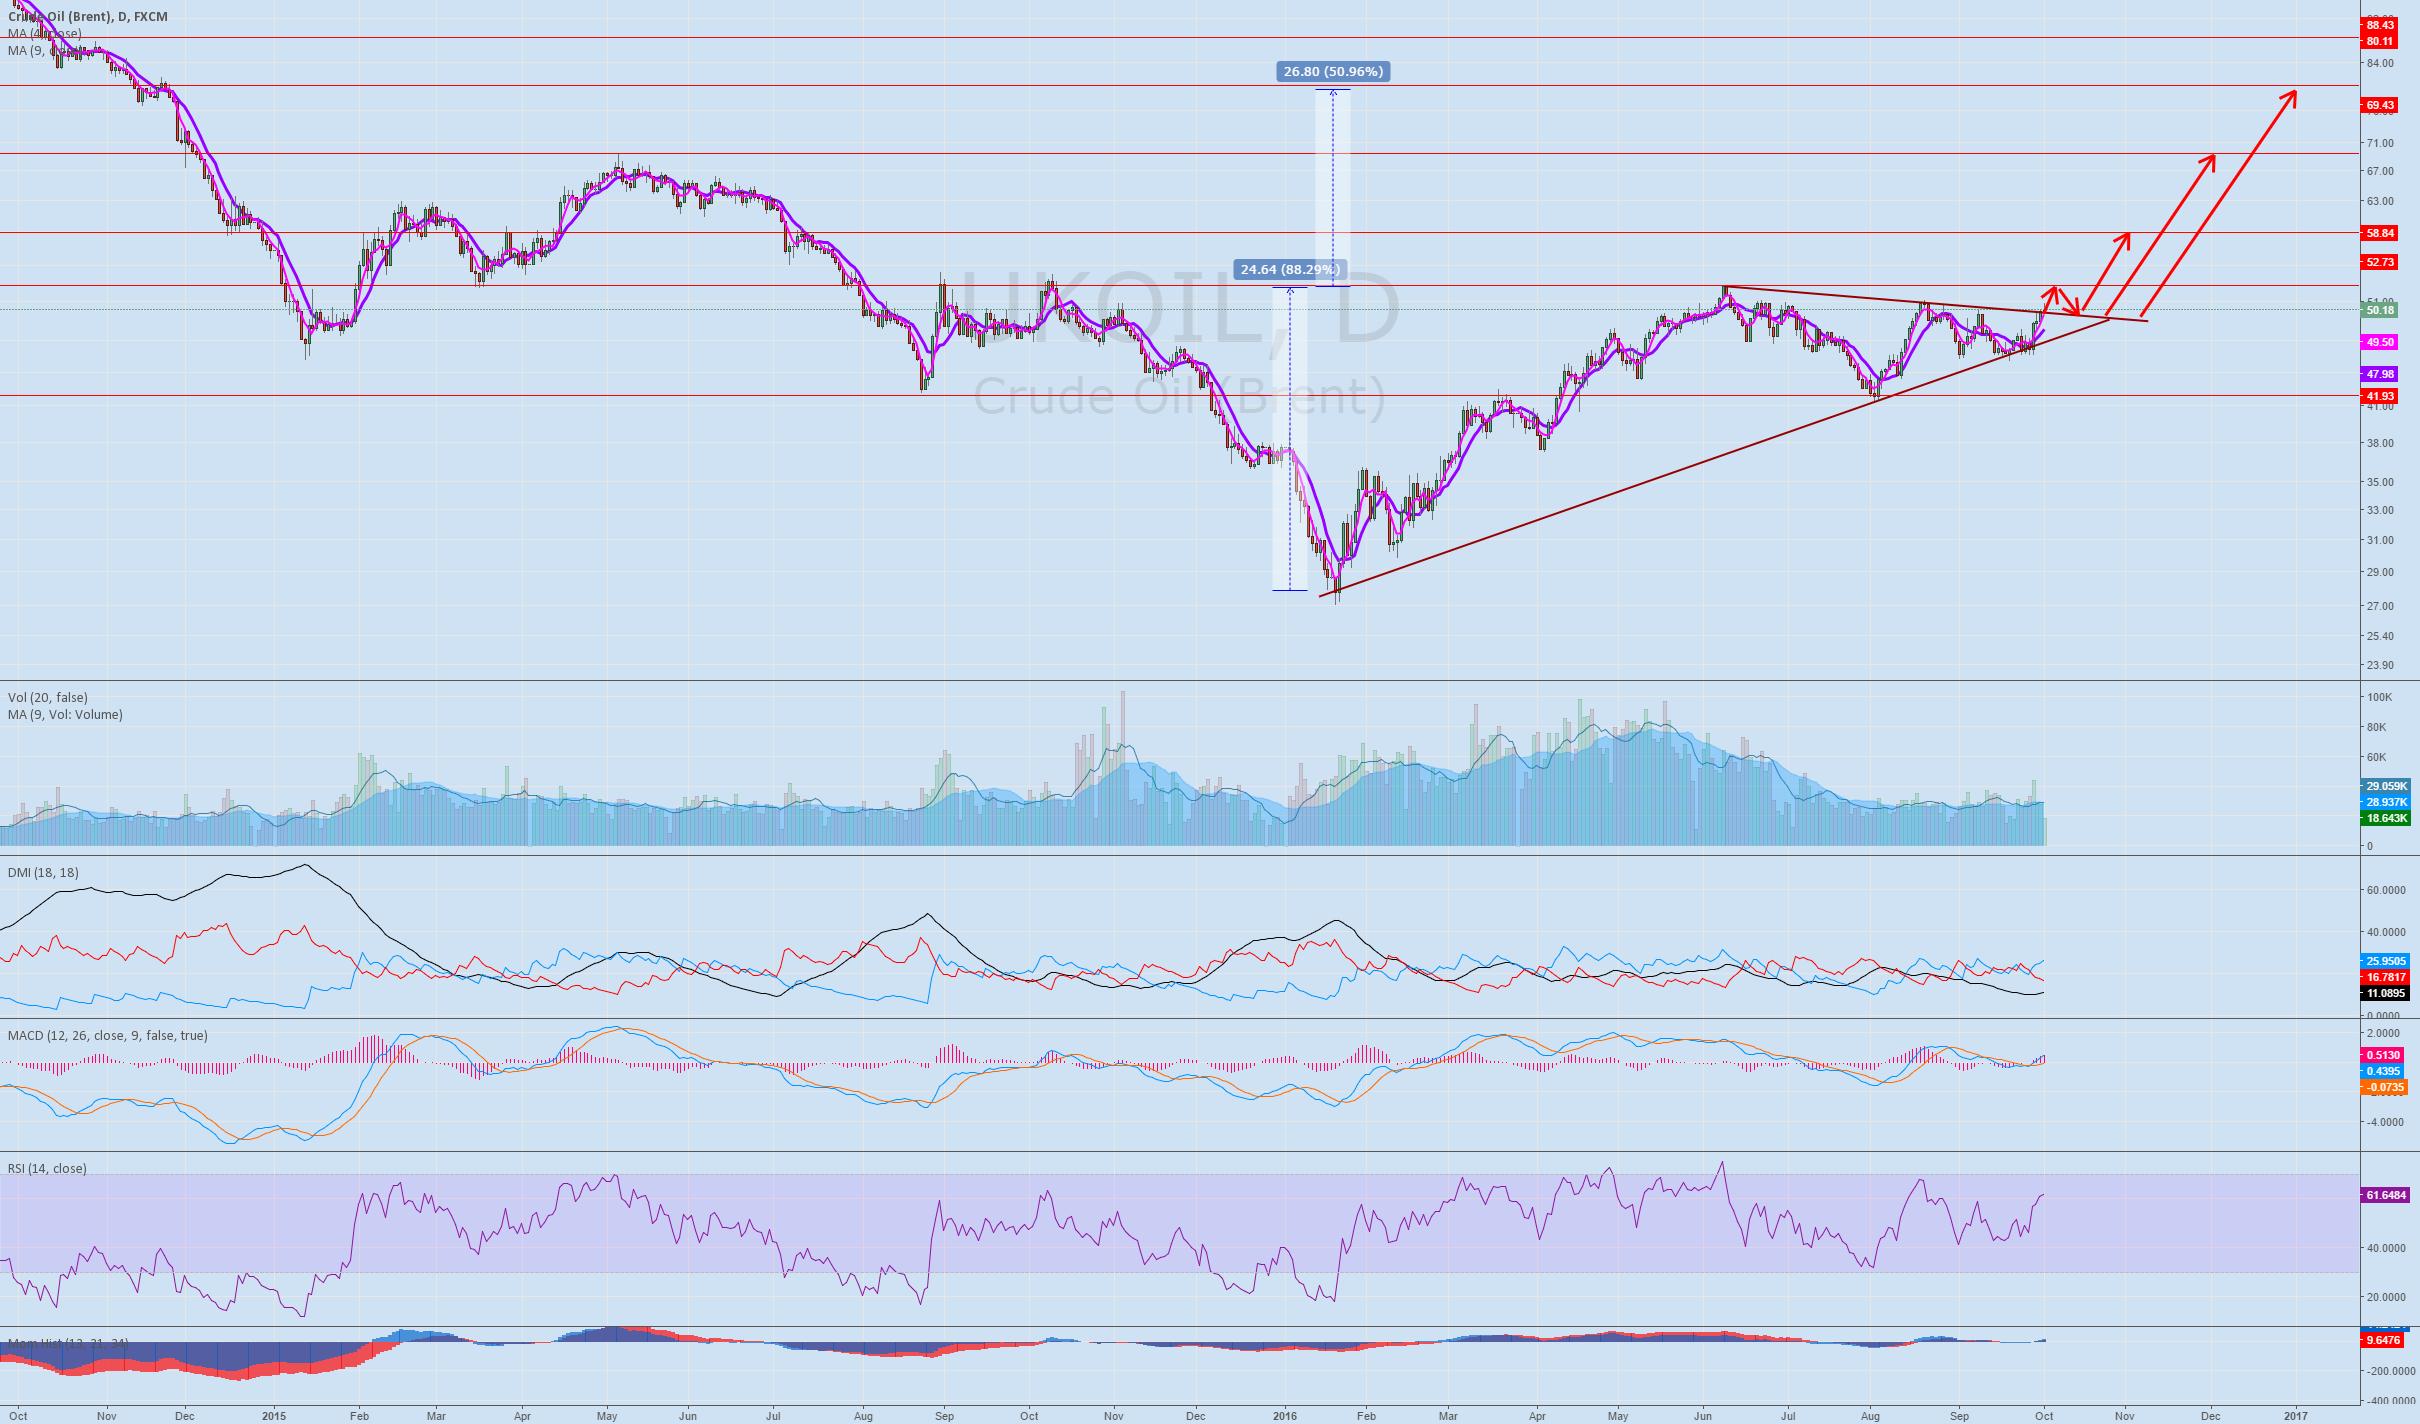 Potential oil breakout